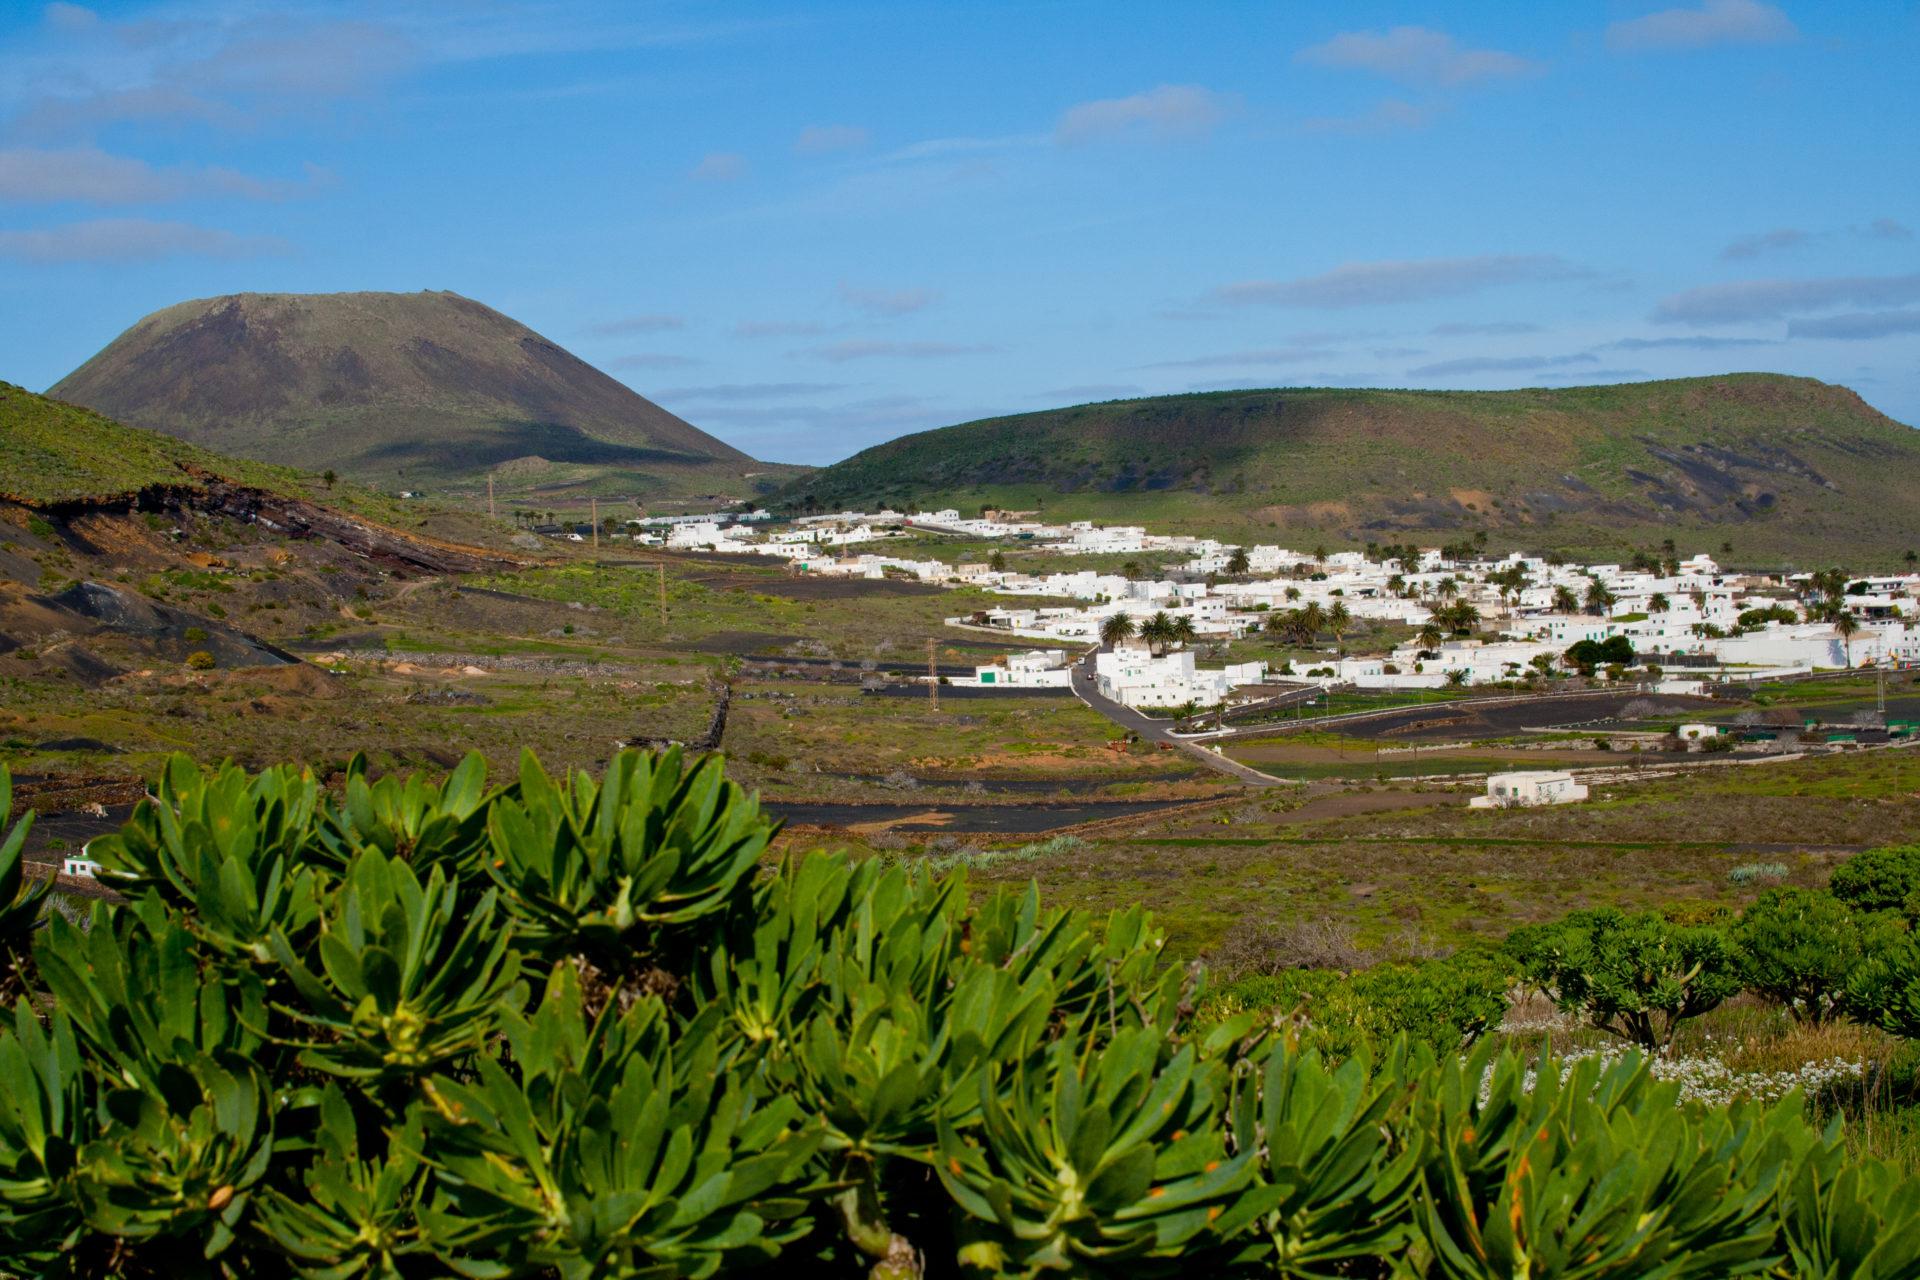 valle haria ruta senderismo volcan de la corona risco famara